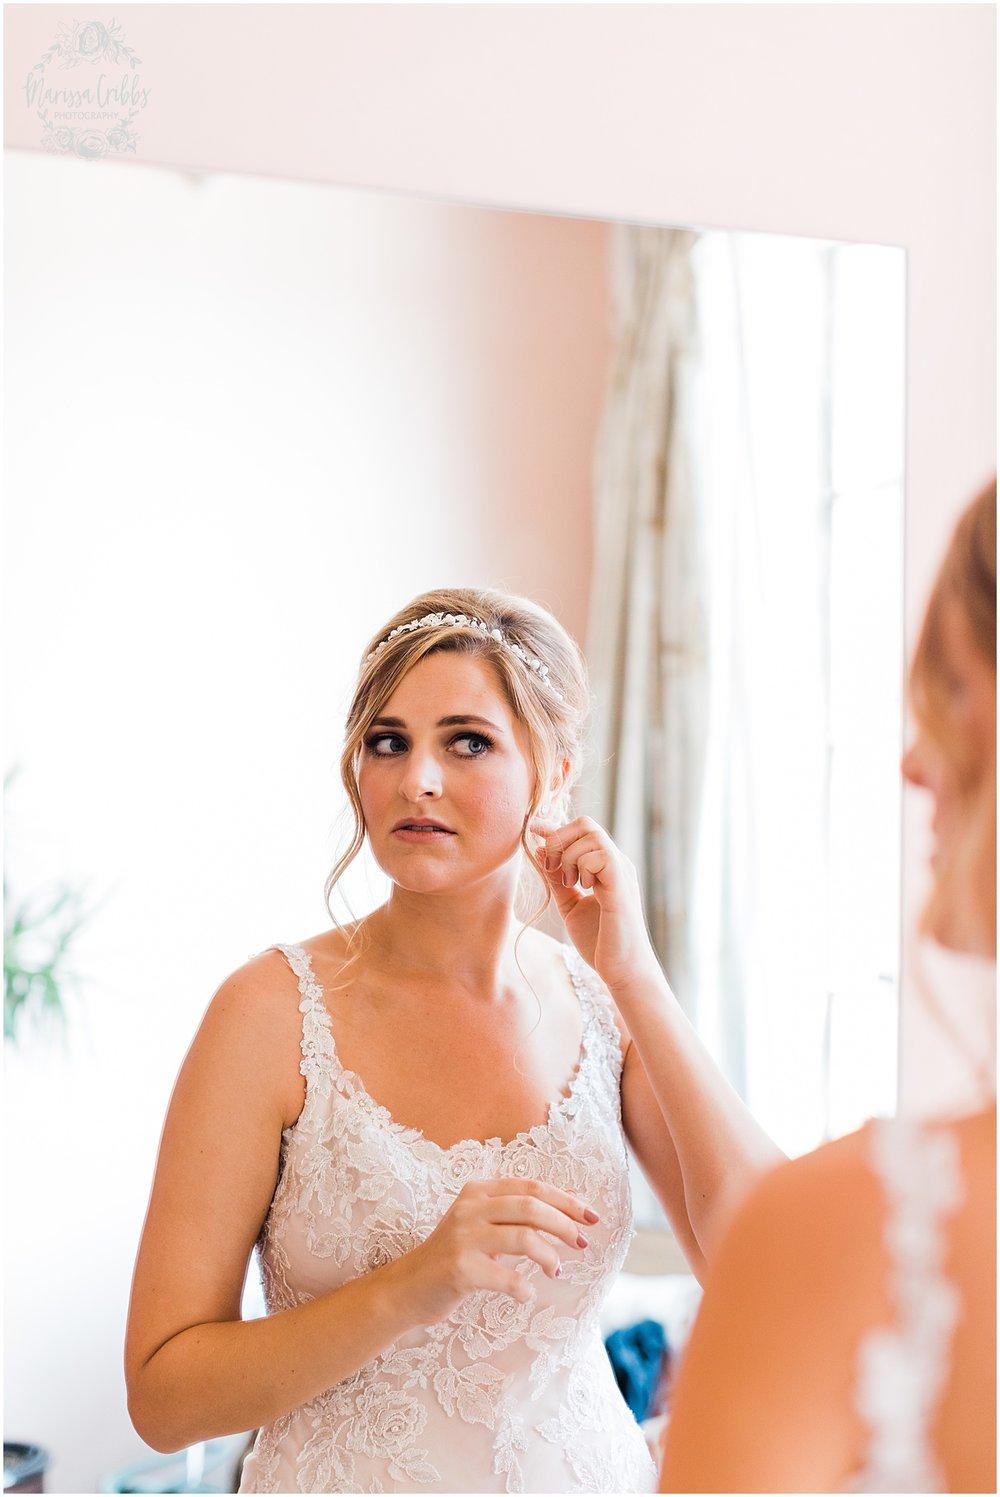 BAUER WEDDING | KELSEA & JUSTIN | MARISSA CRIBBS PHOTOGRAPHY_6496.jpg